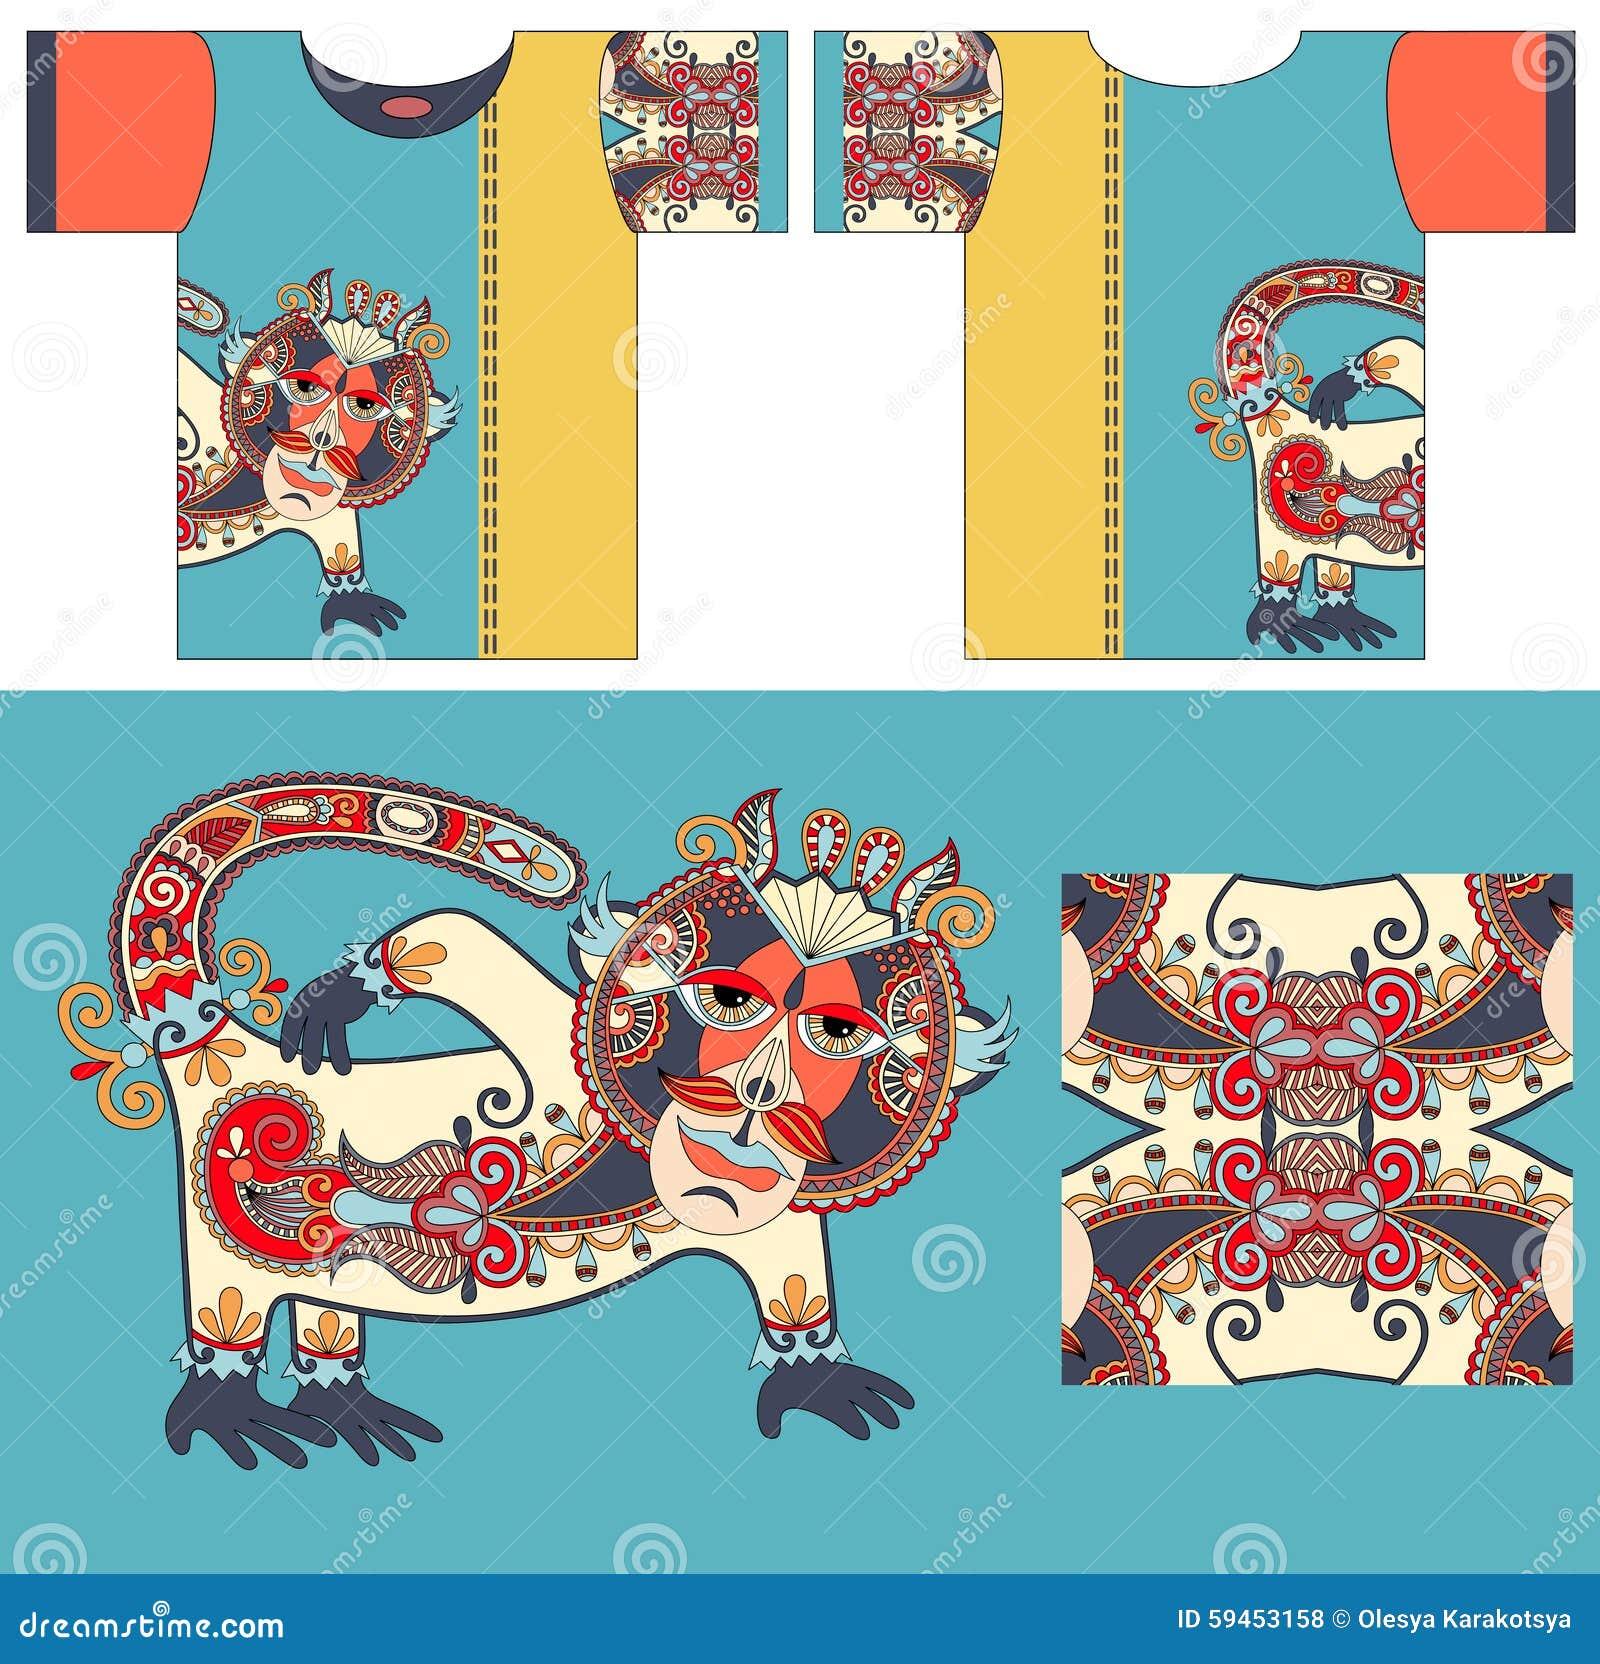 Shirt design unique - T Shirt Design With Unique Decorative Fantasy